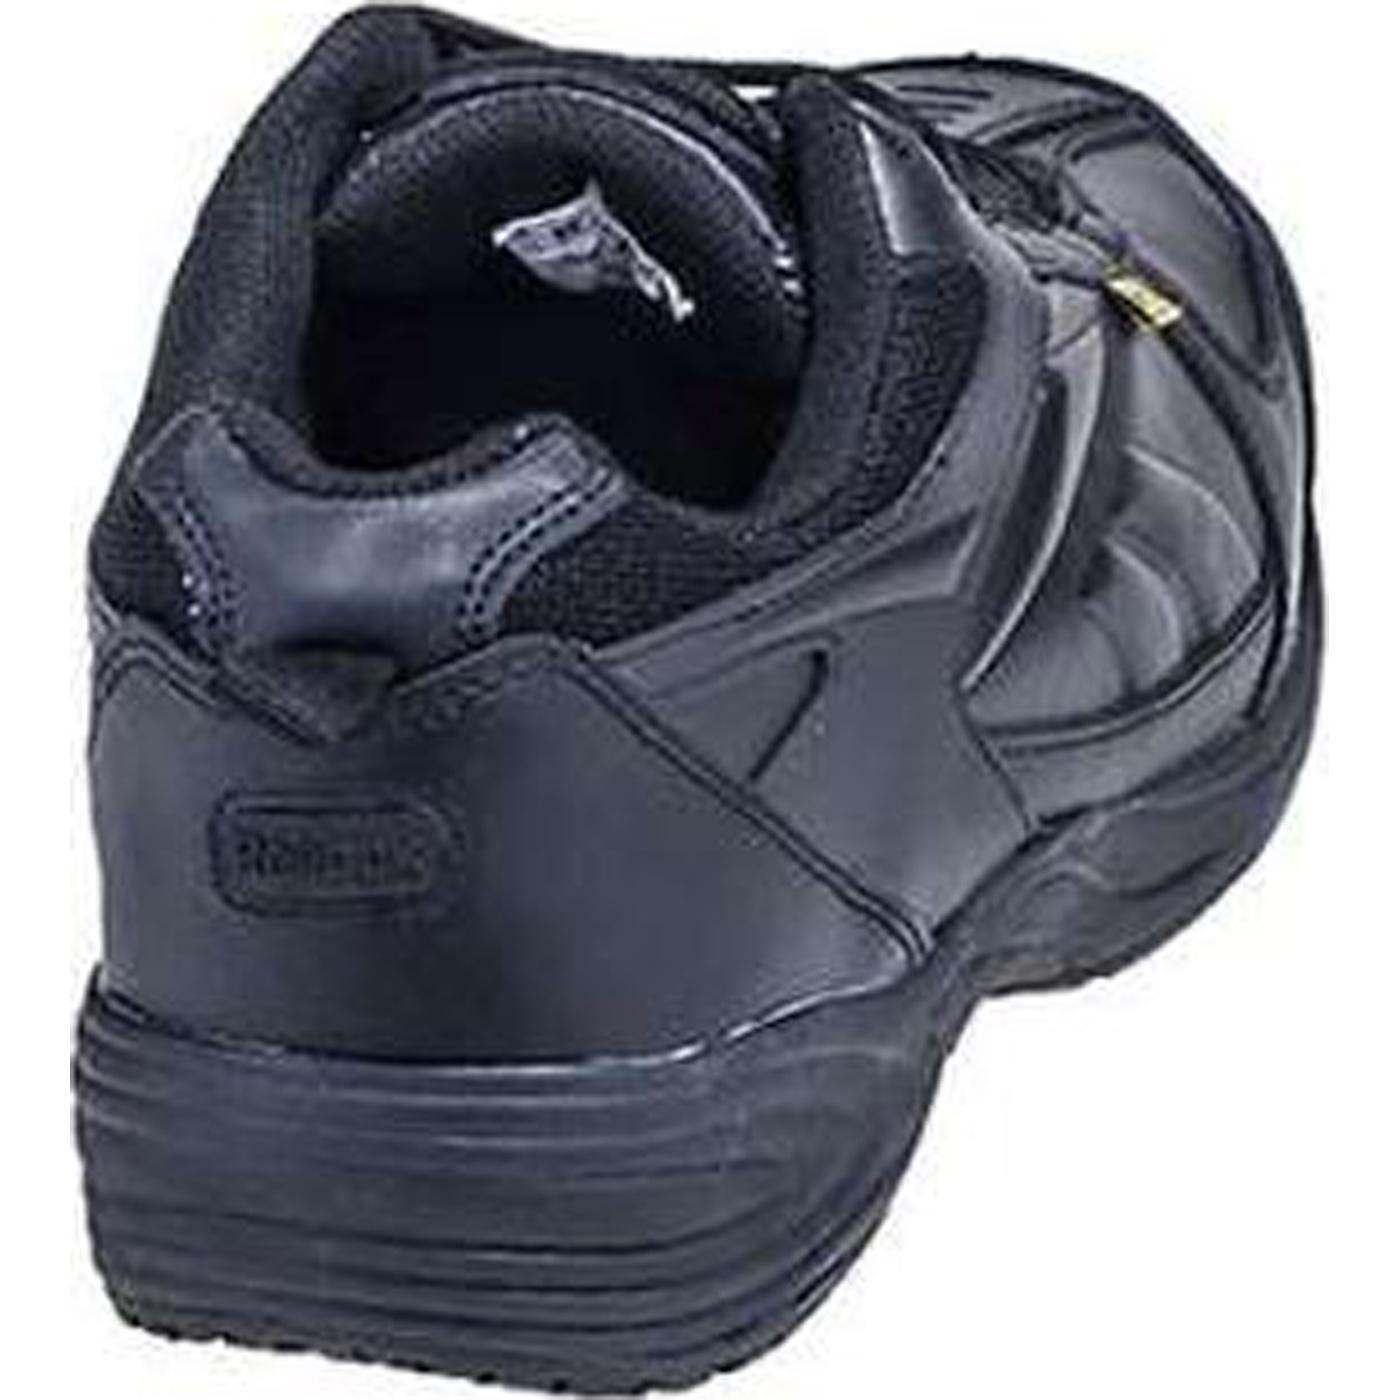 cac0c3c4d6f Black Athletic Reebok Composite Toe Met Guard Work Shoe